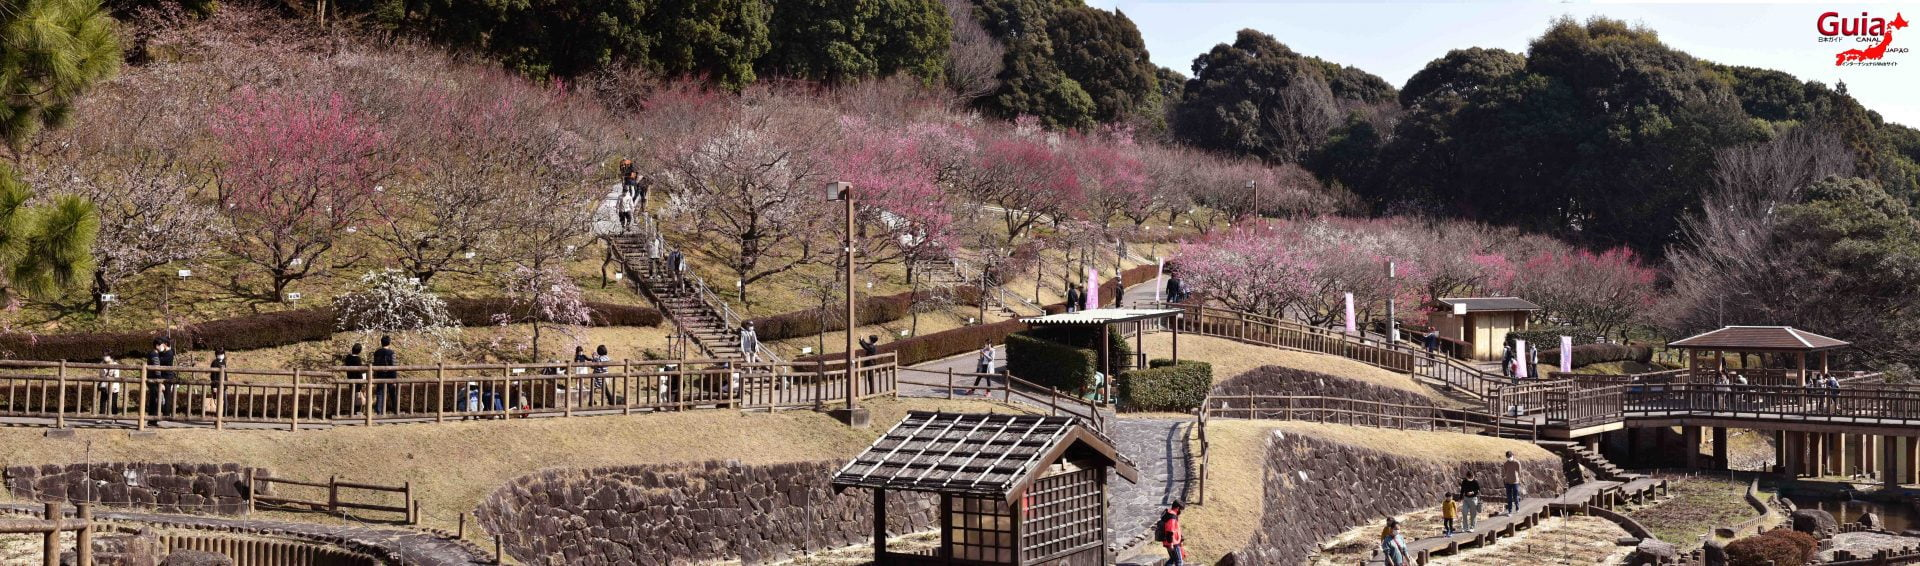 Festival Flor de Ameixa (Ume) - Parque Akatsukayama Toyokawa 1